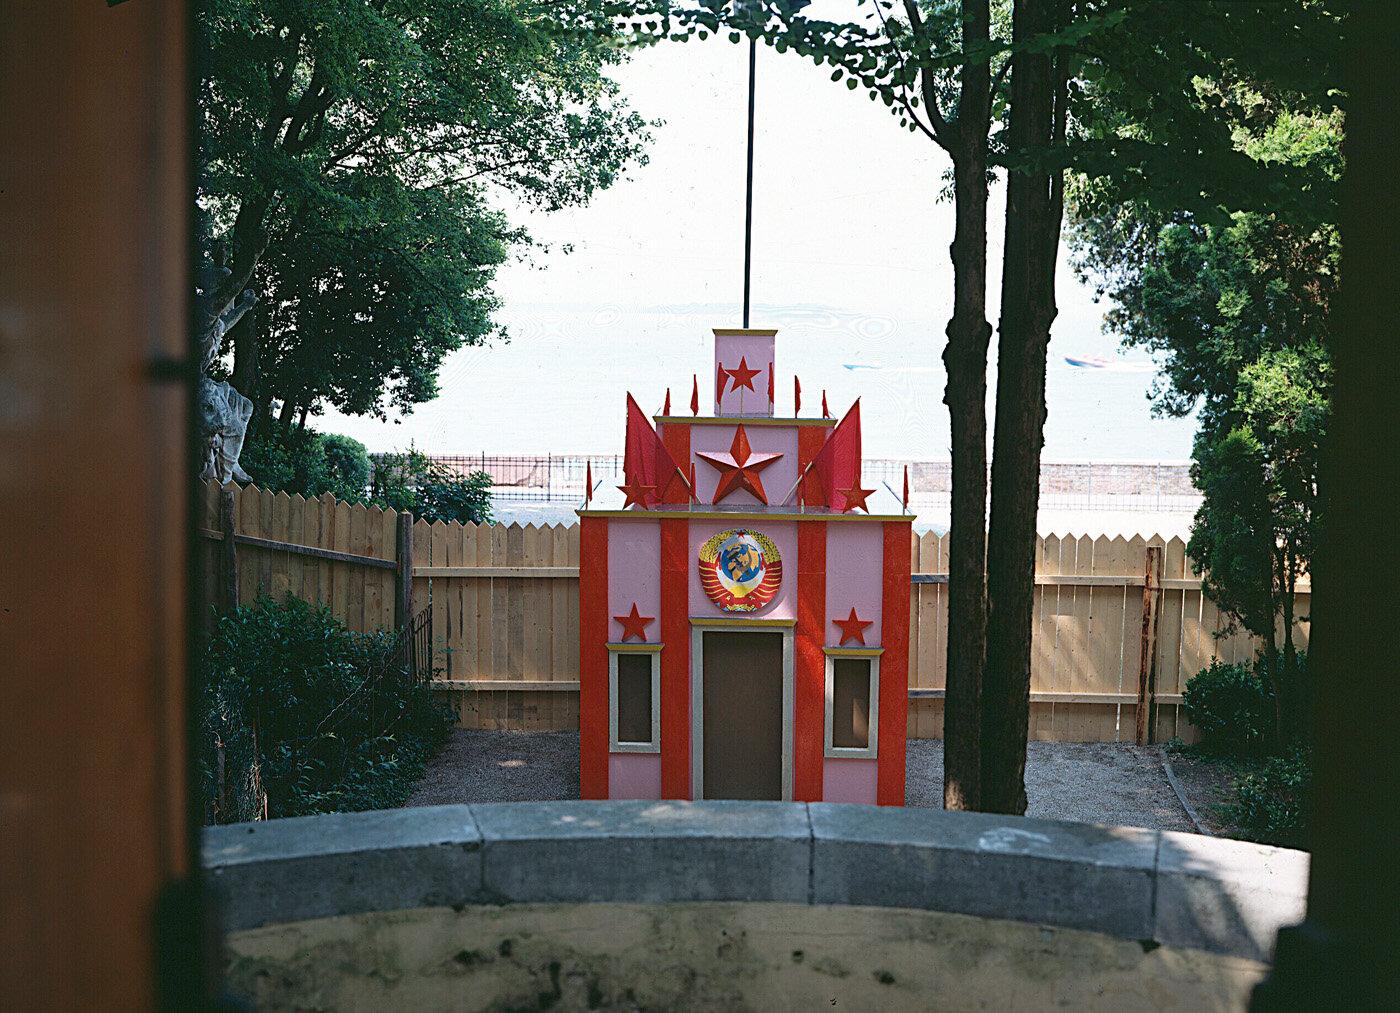 The-Red-Pavilion-7.jpg